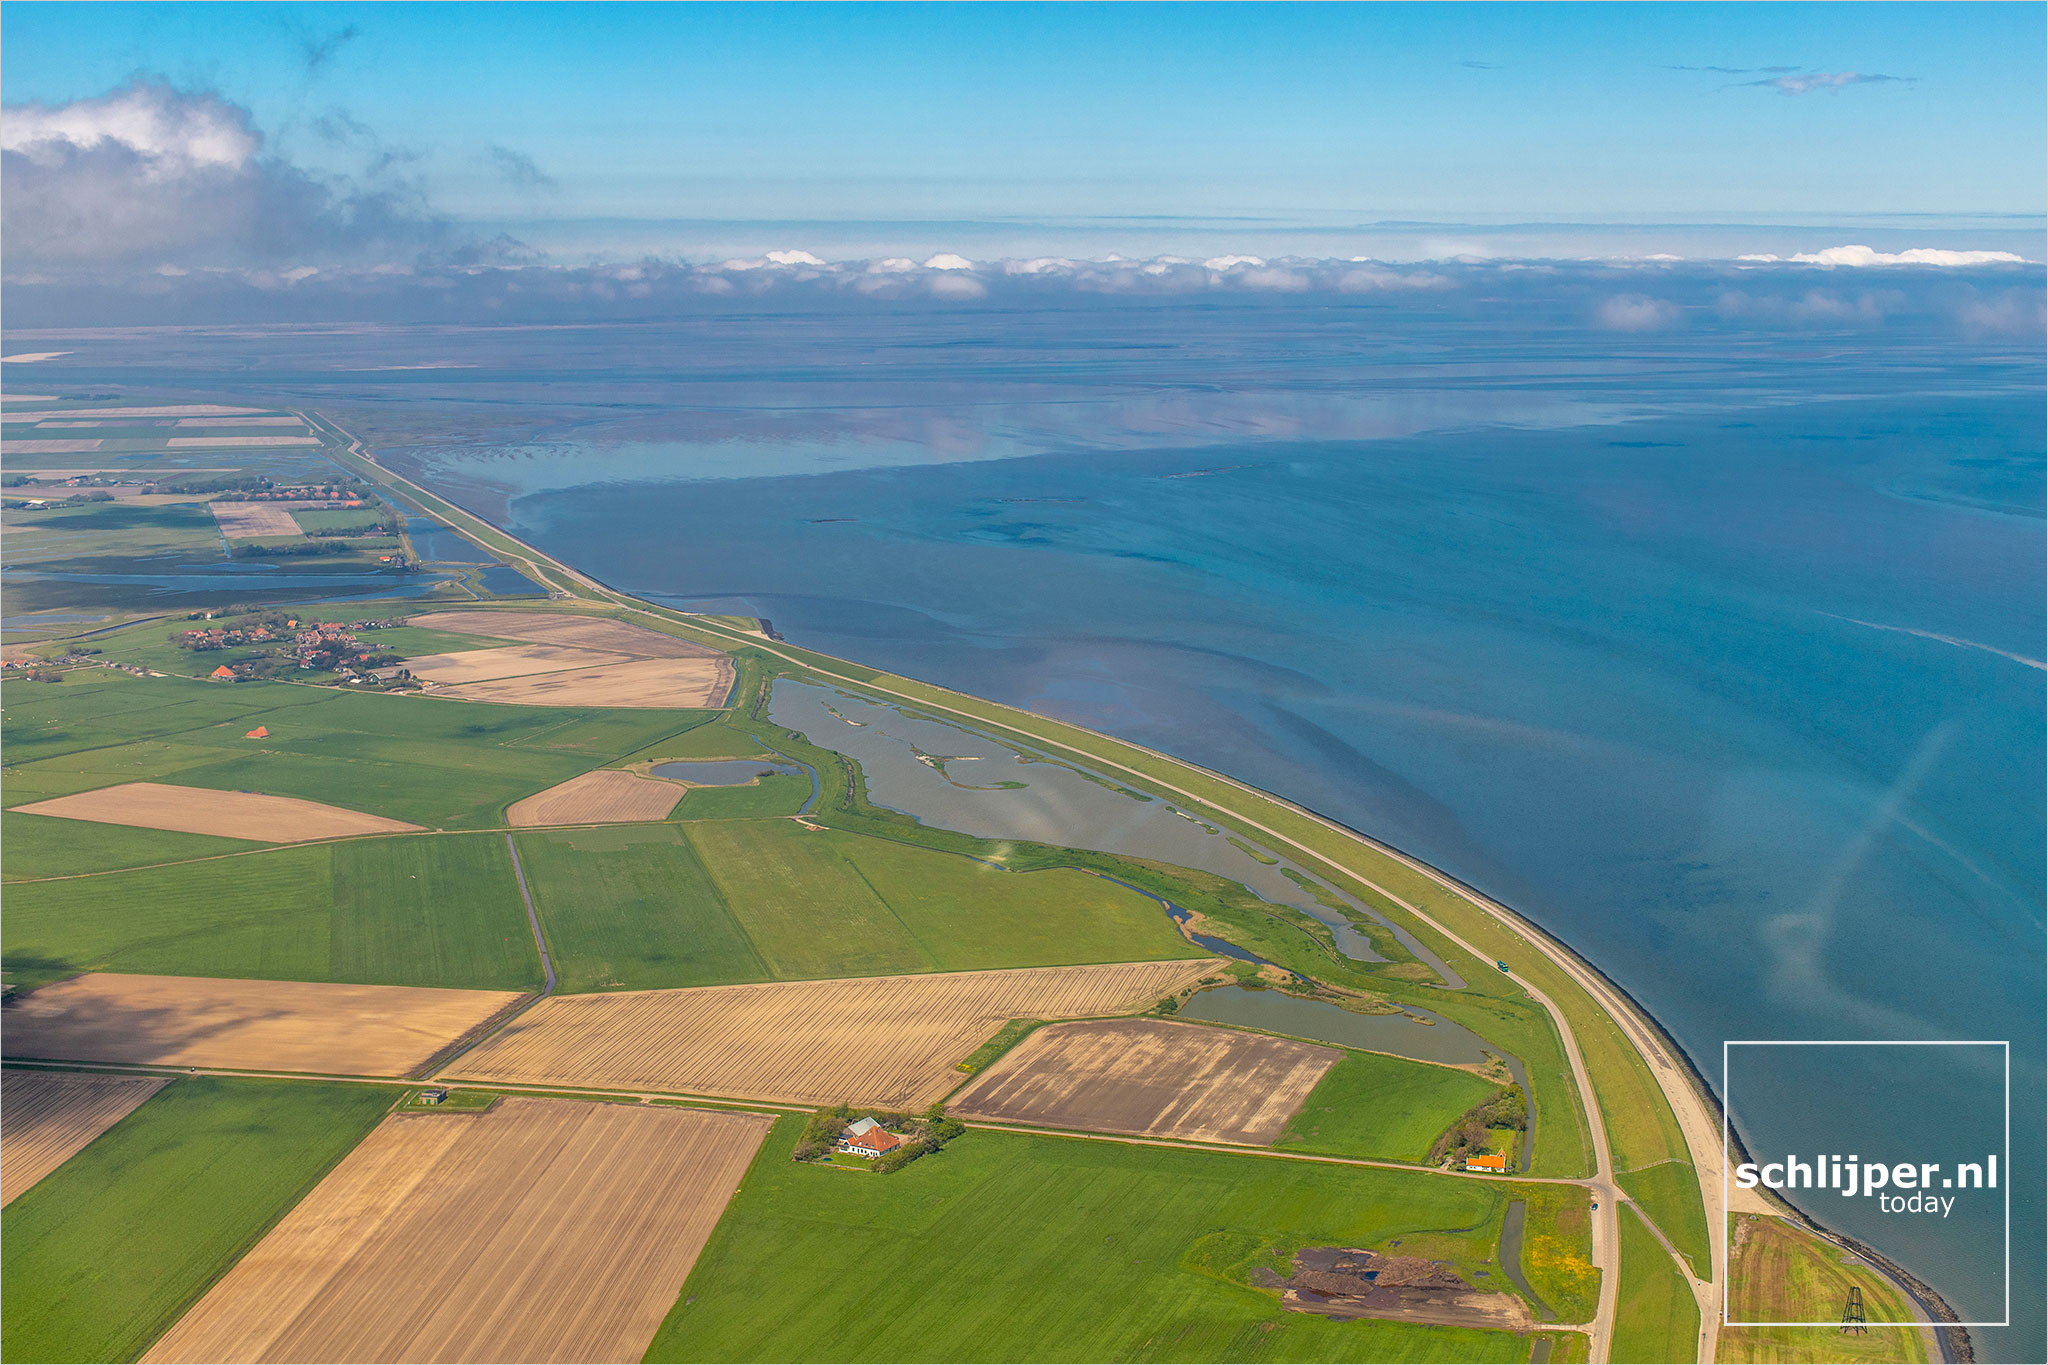 The Netherlands, Texel, 28 mei 2021